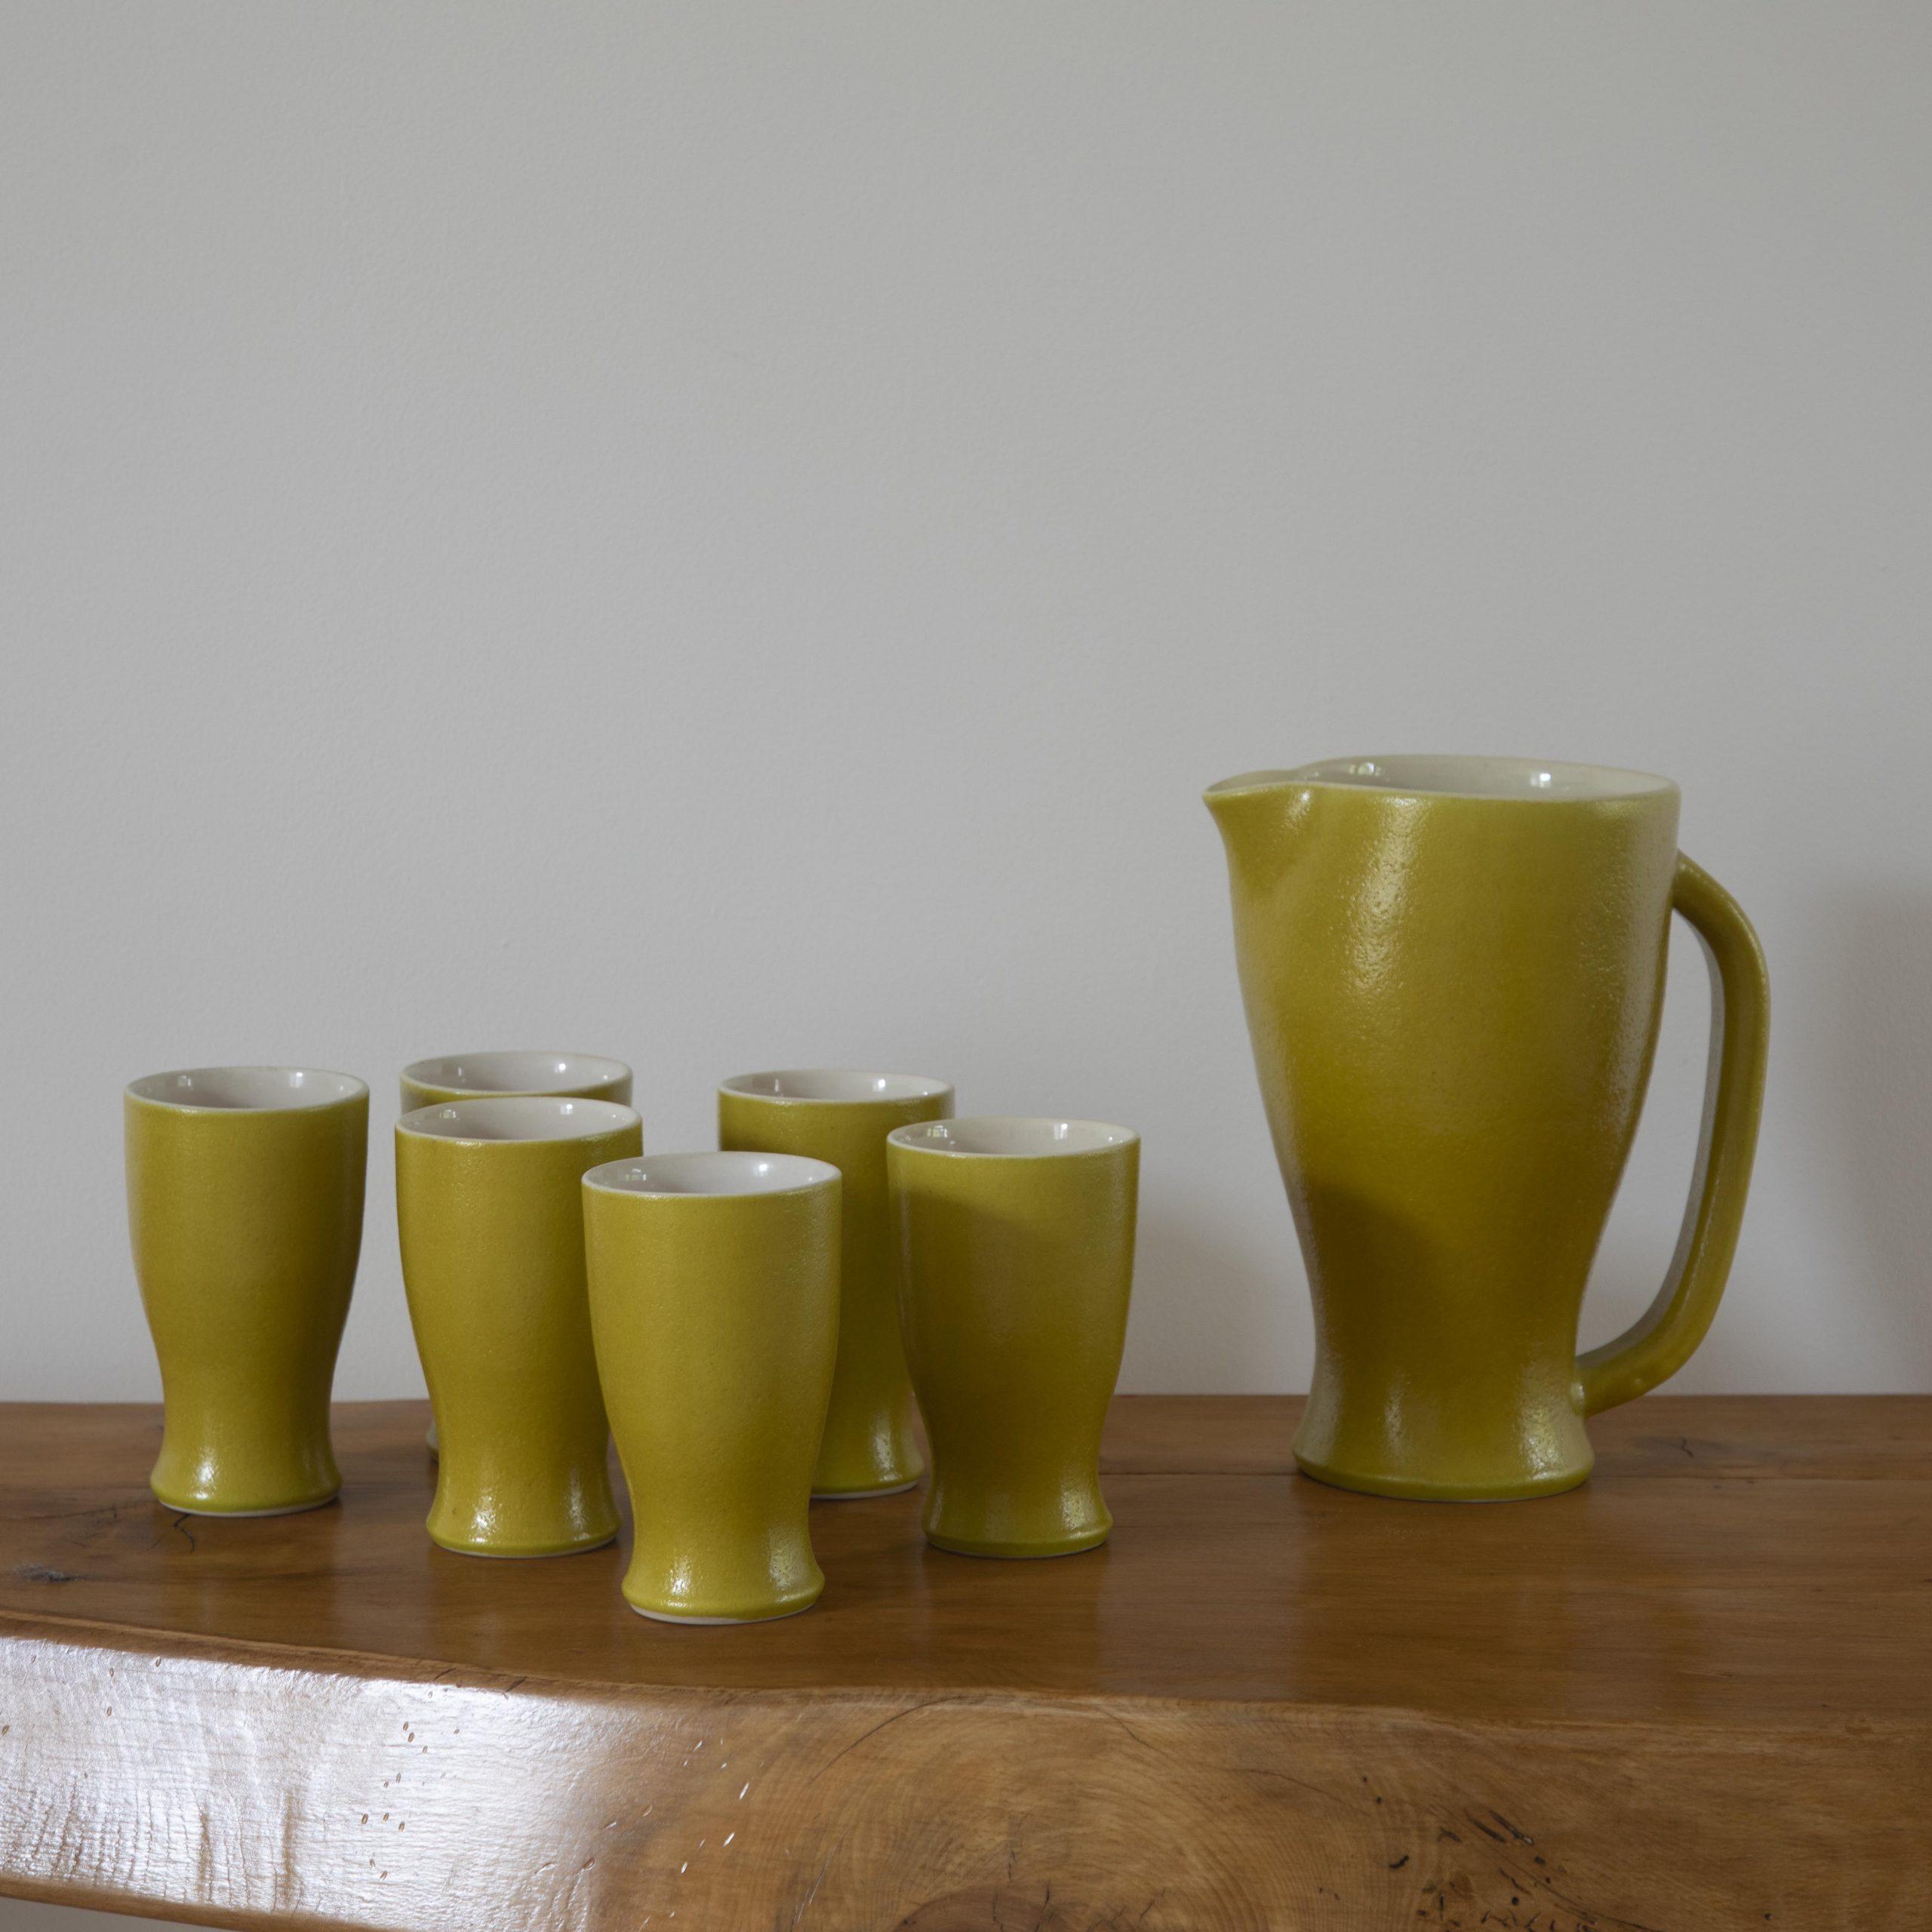 Ceramics by Pol Chambost